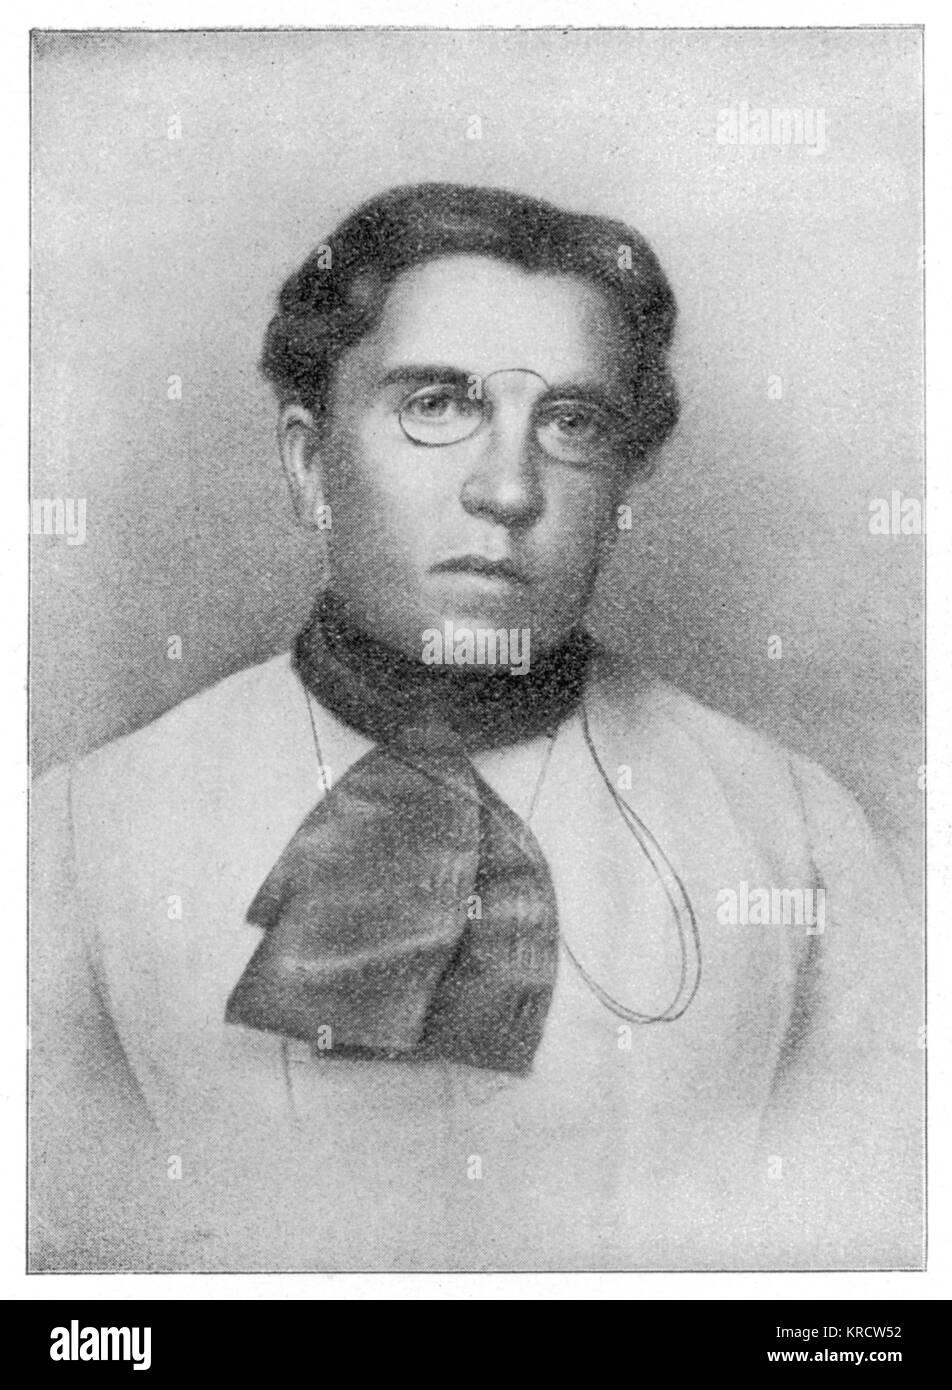 EMMA GOLDMAN Lithuanian born American Anarchist agitator, whose teachings inspired Leon Czolgosz to assassinate - Stock Image